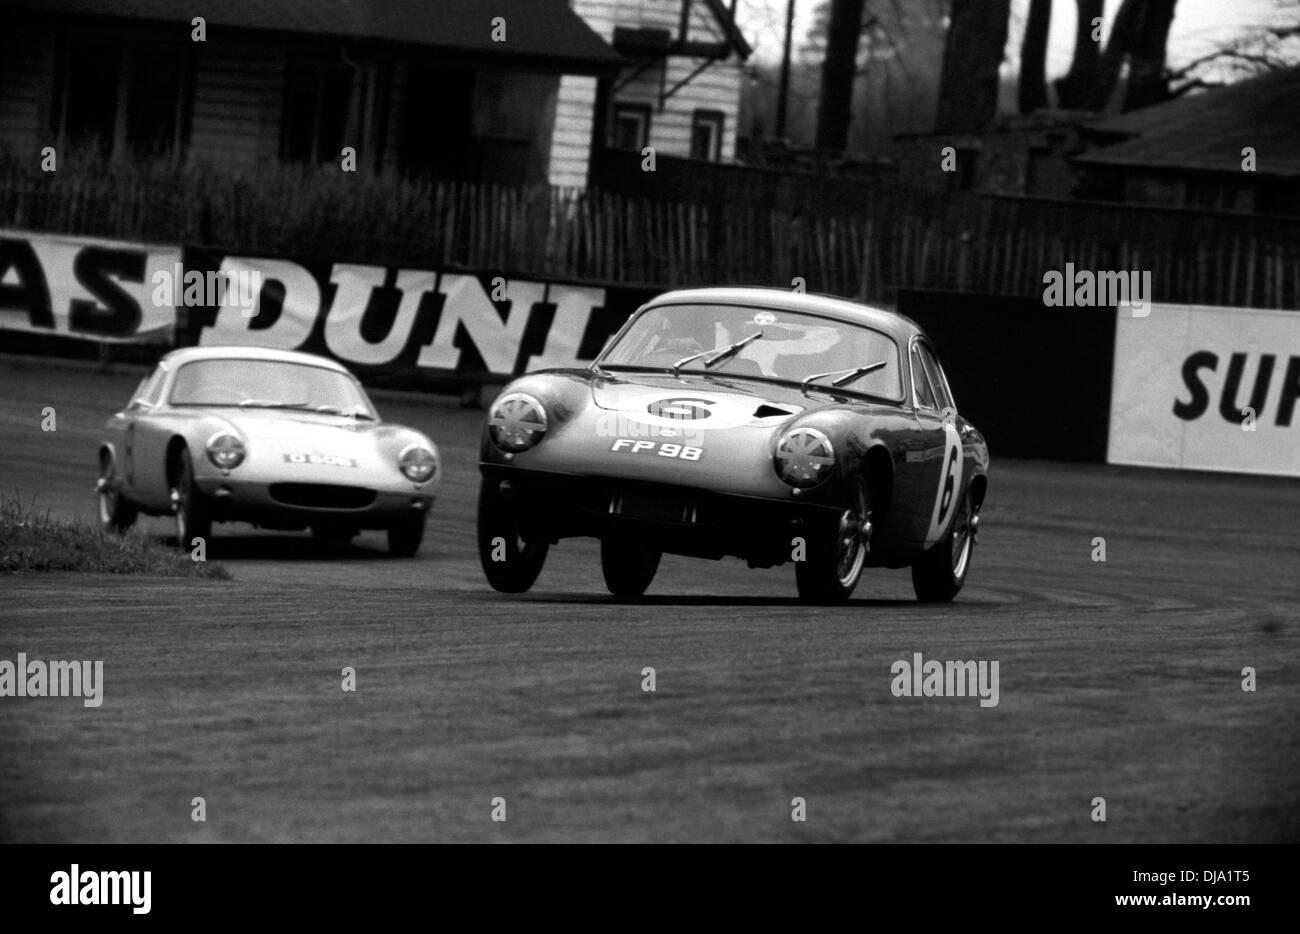 Lotus Elites Racing At Oulton Park, England 2 April 1960.   Stock Image